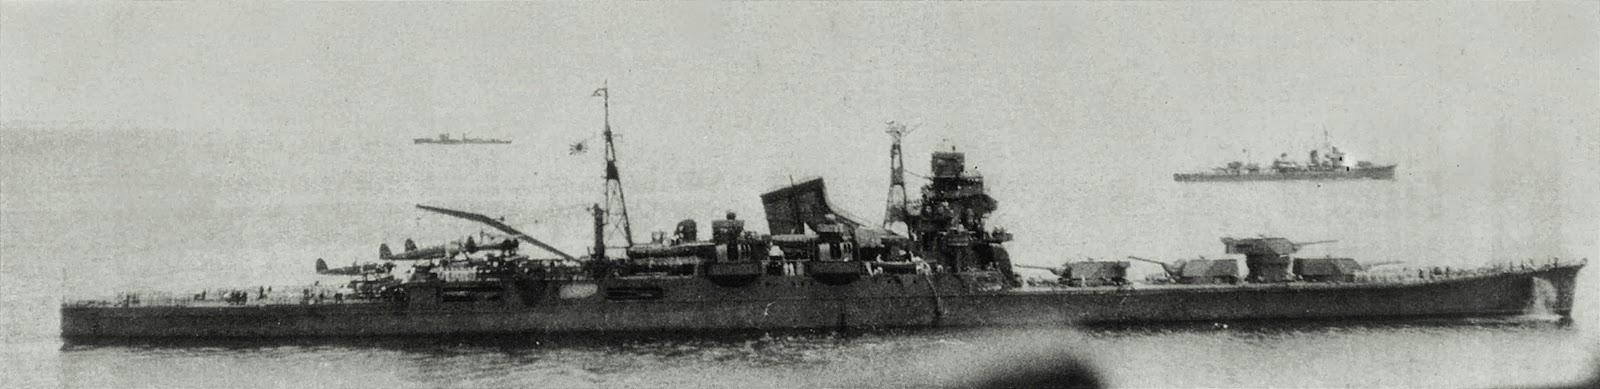 Japanese Heavy Cruiser  Tone , 1942. The Tone was towed to Etajima where it was used for training (viz.wikipedia).